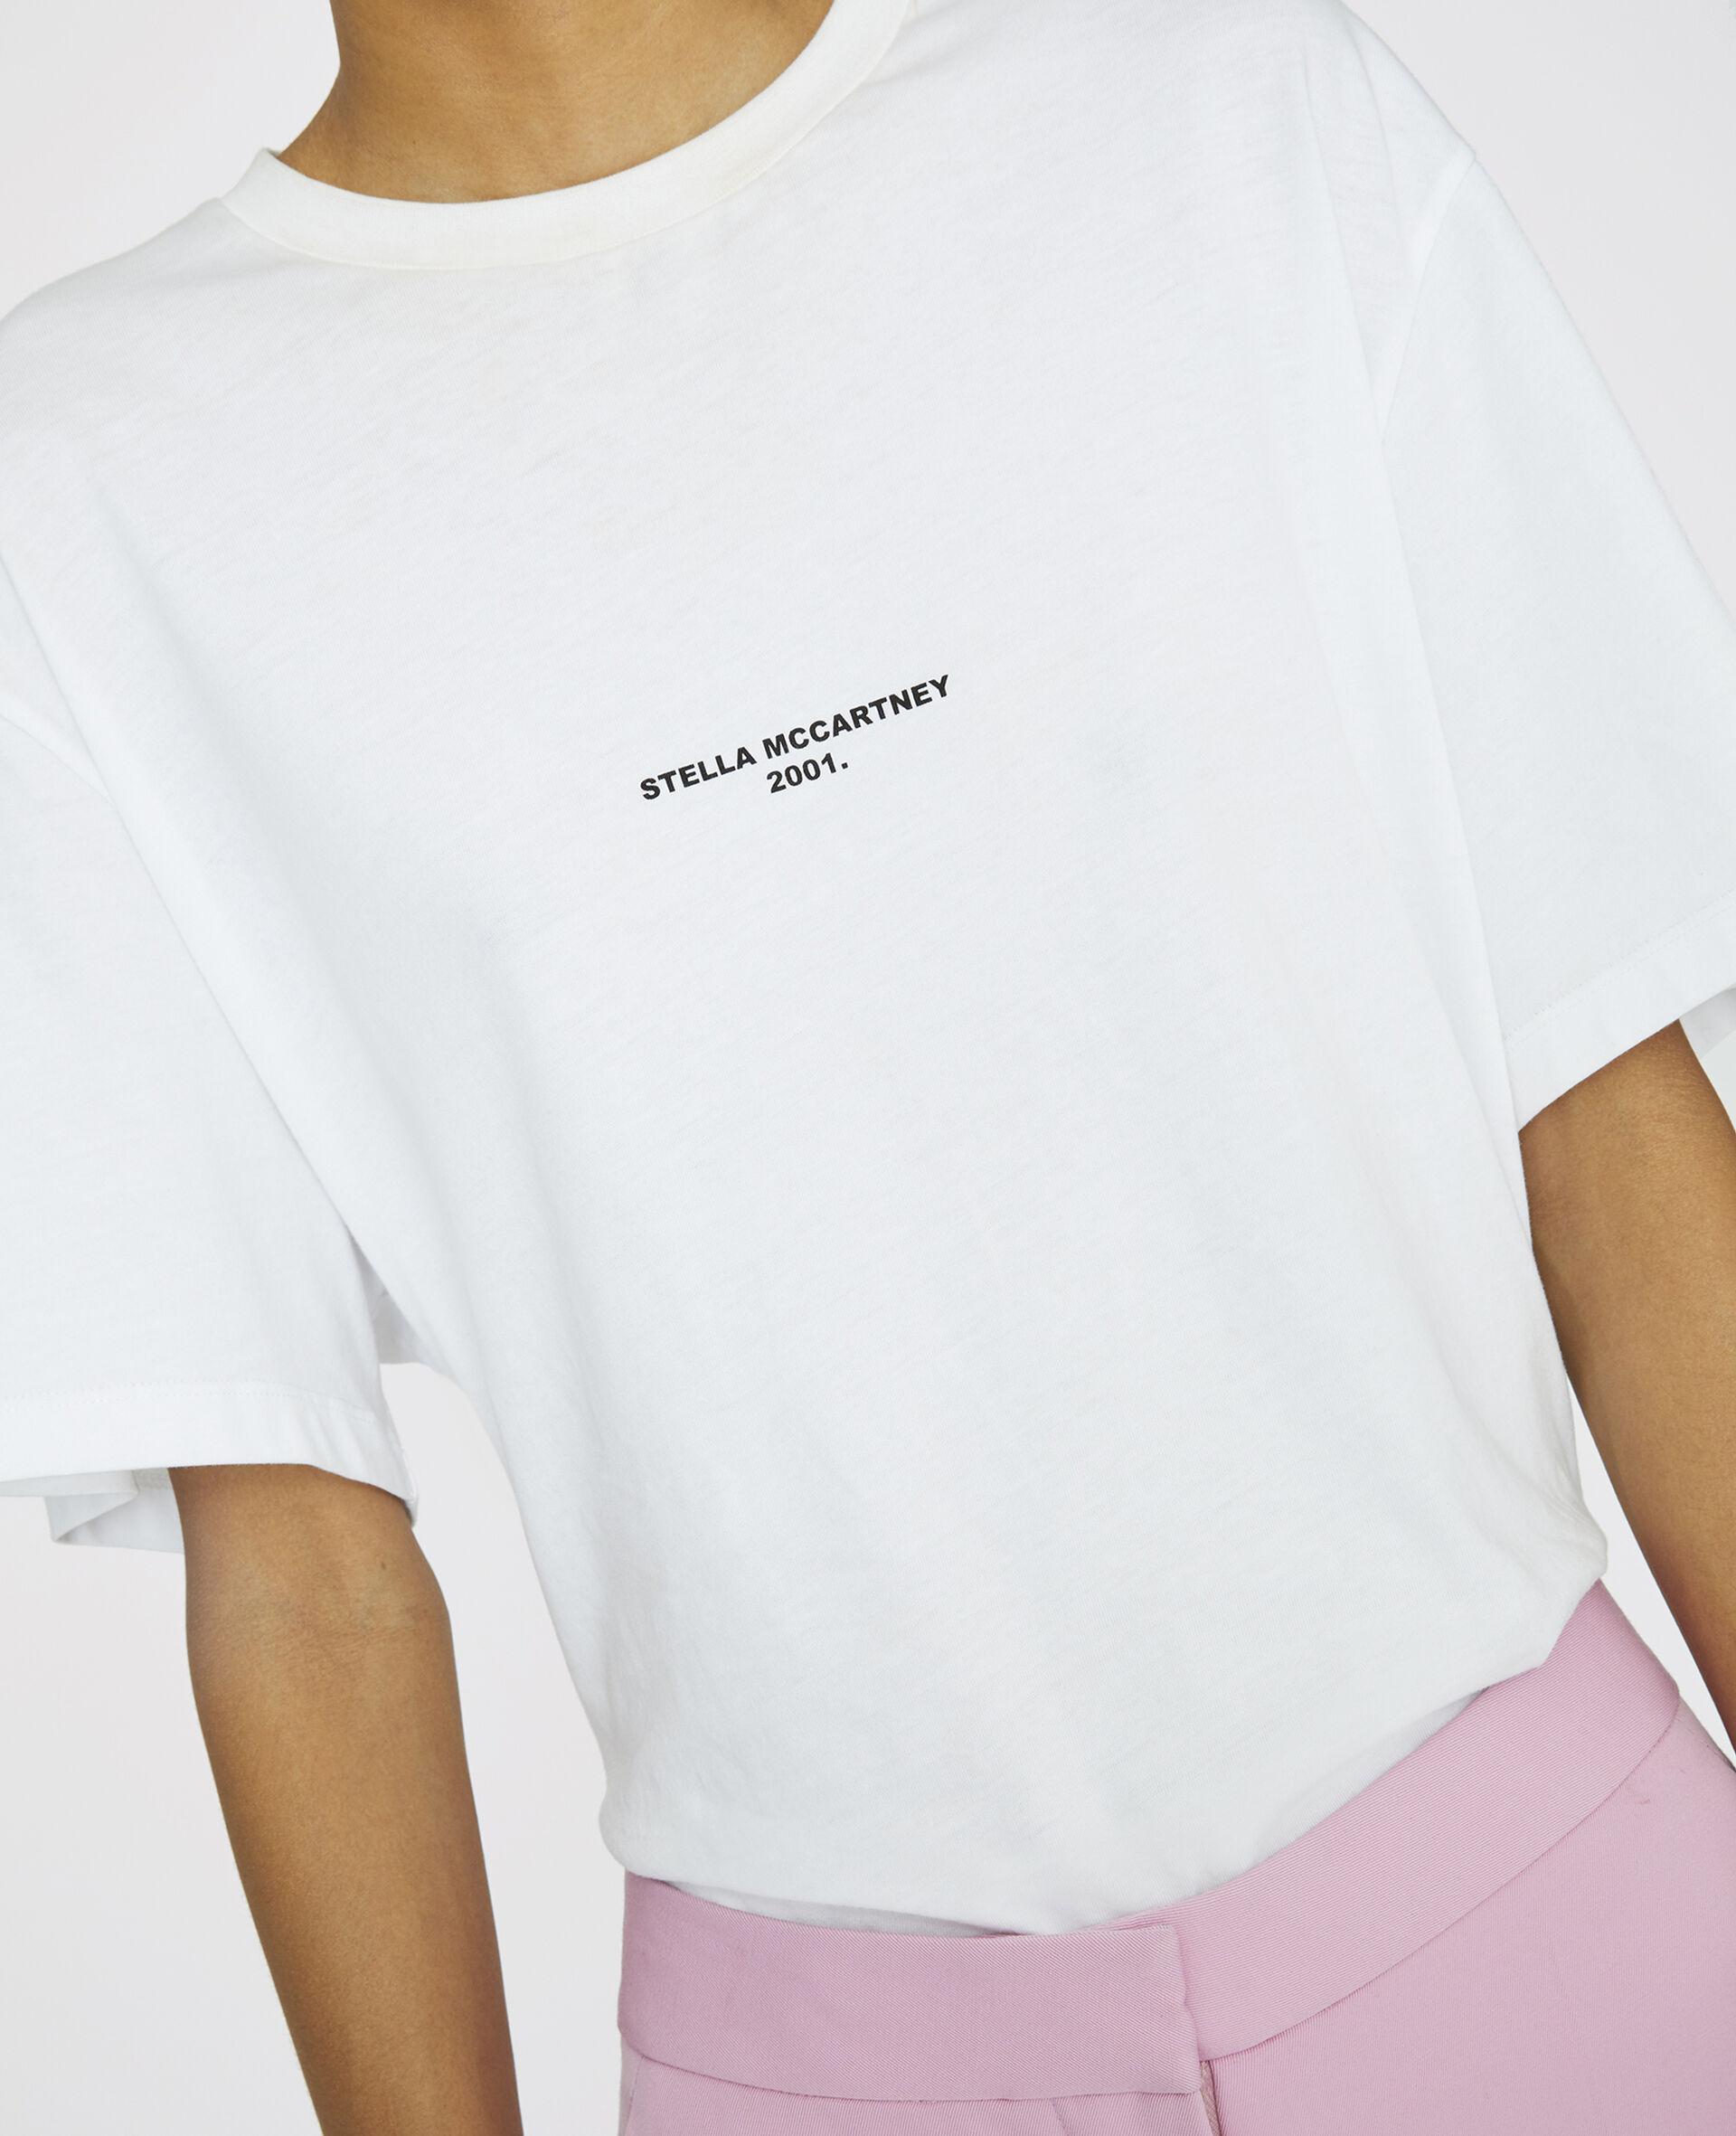 Stella McCartney 2001. T-shirt-Black-large image number 3